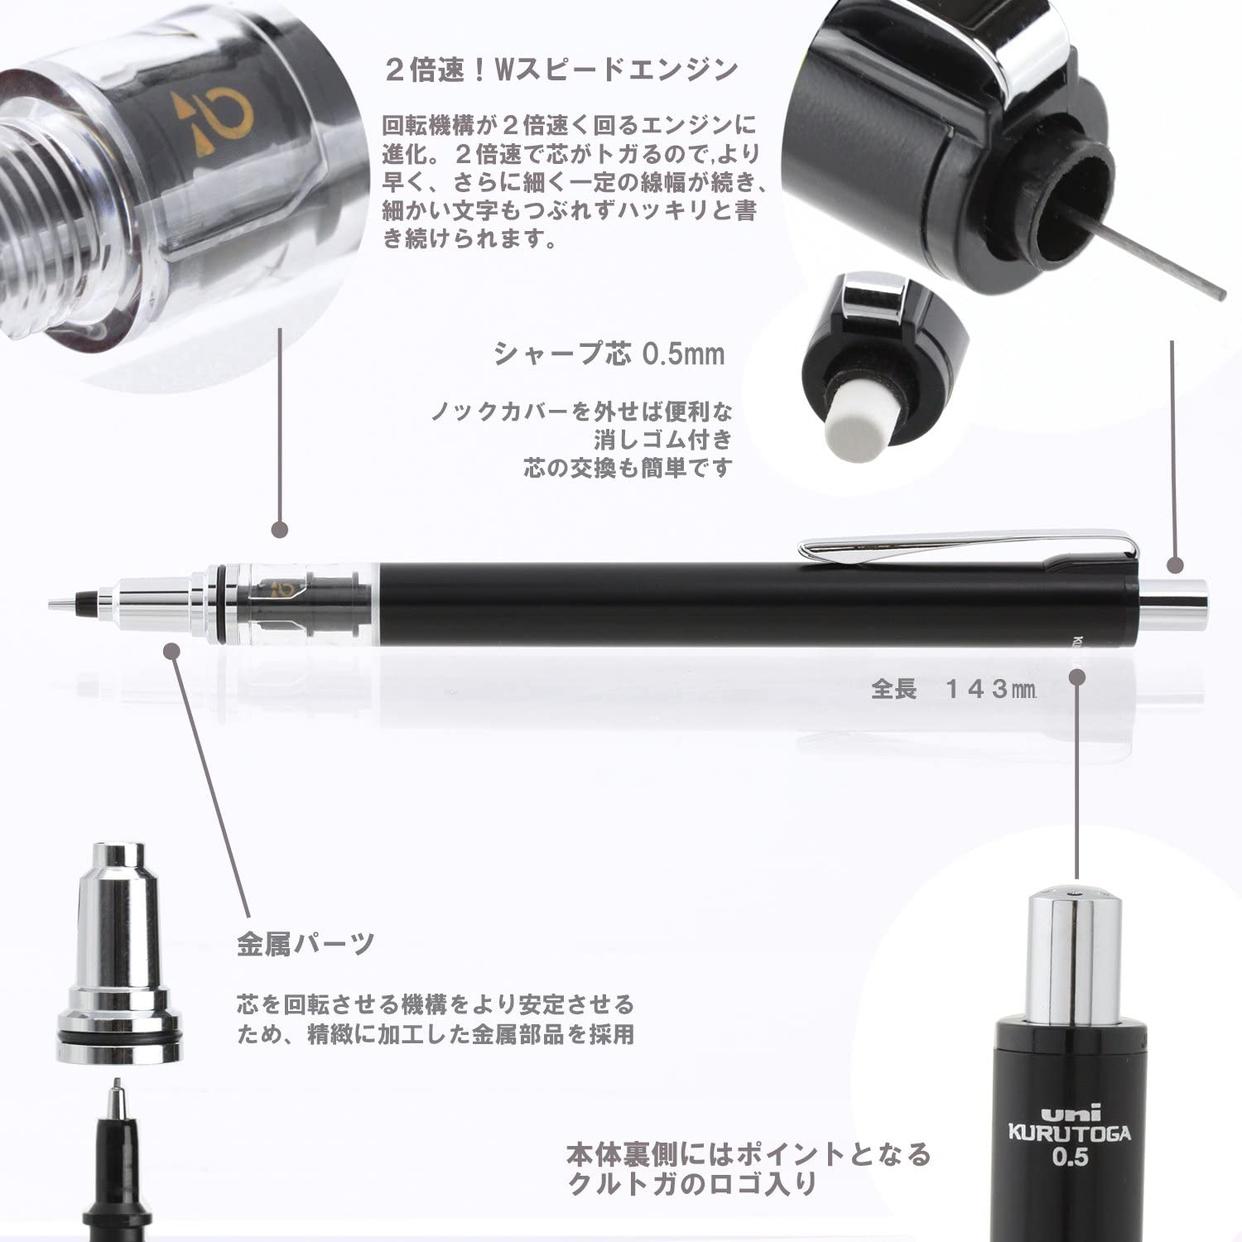 KURU TOGA(クルトガ) アドバンス アップグレードモデル  M5-1030 1Pの商品画像3